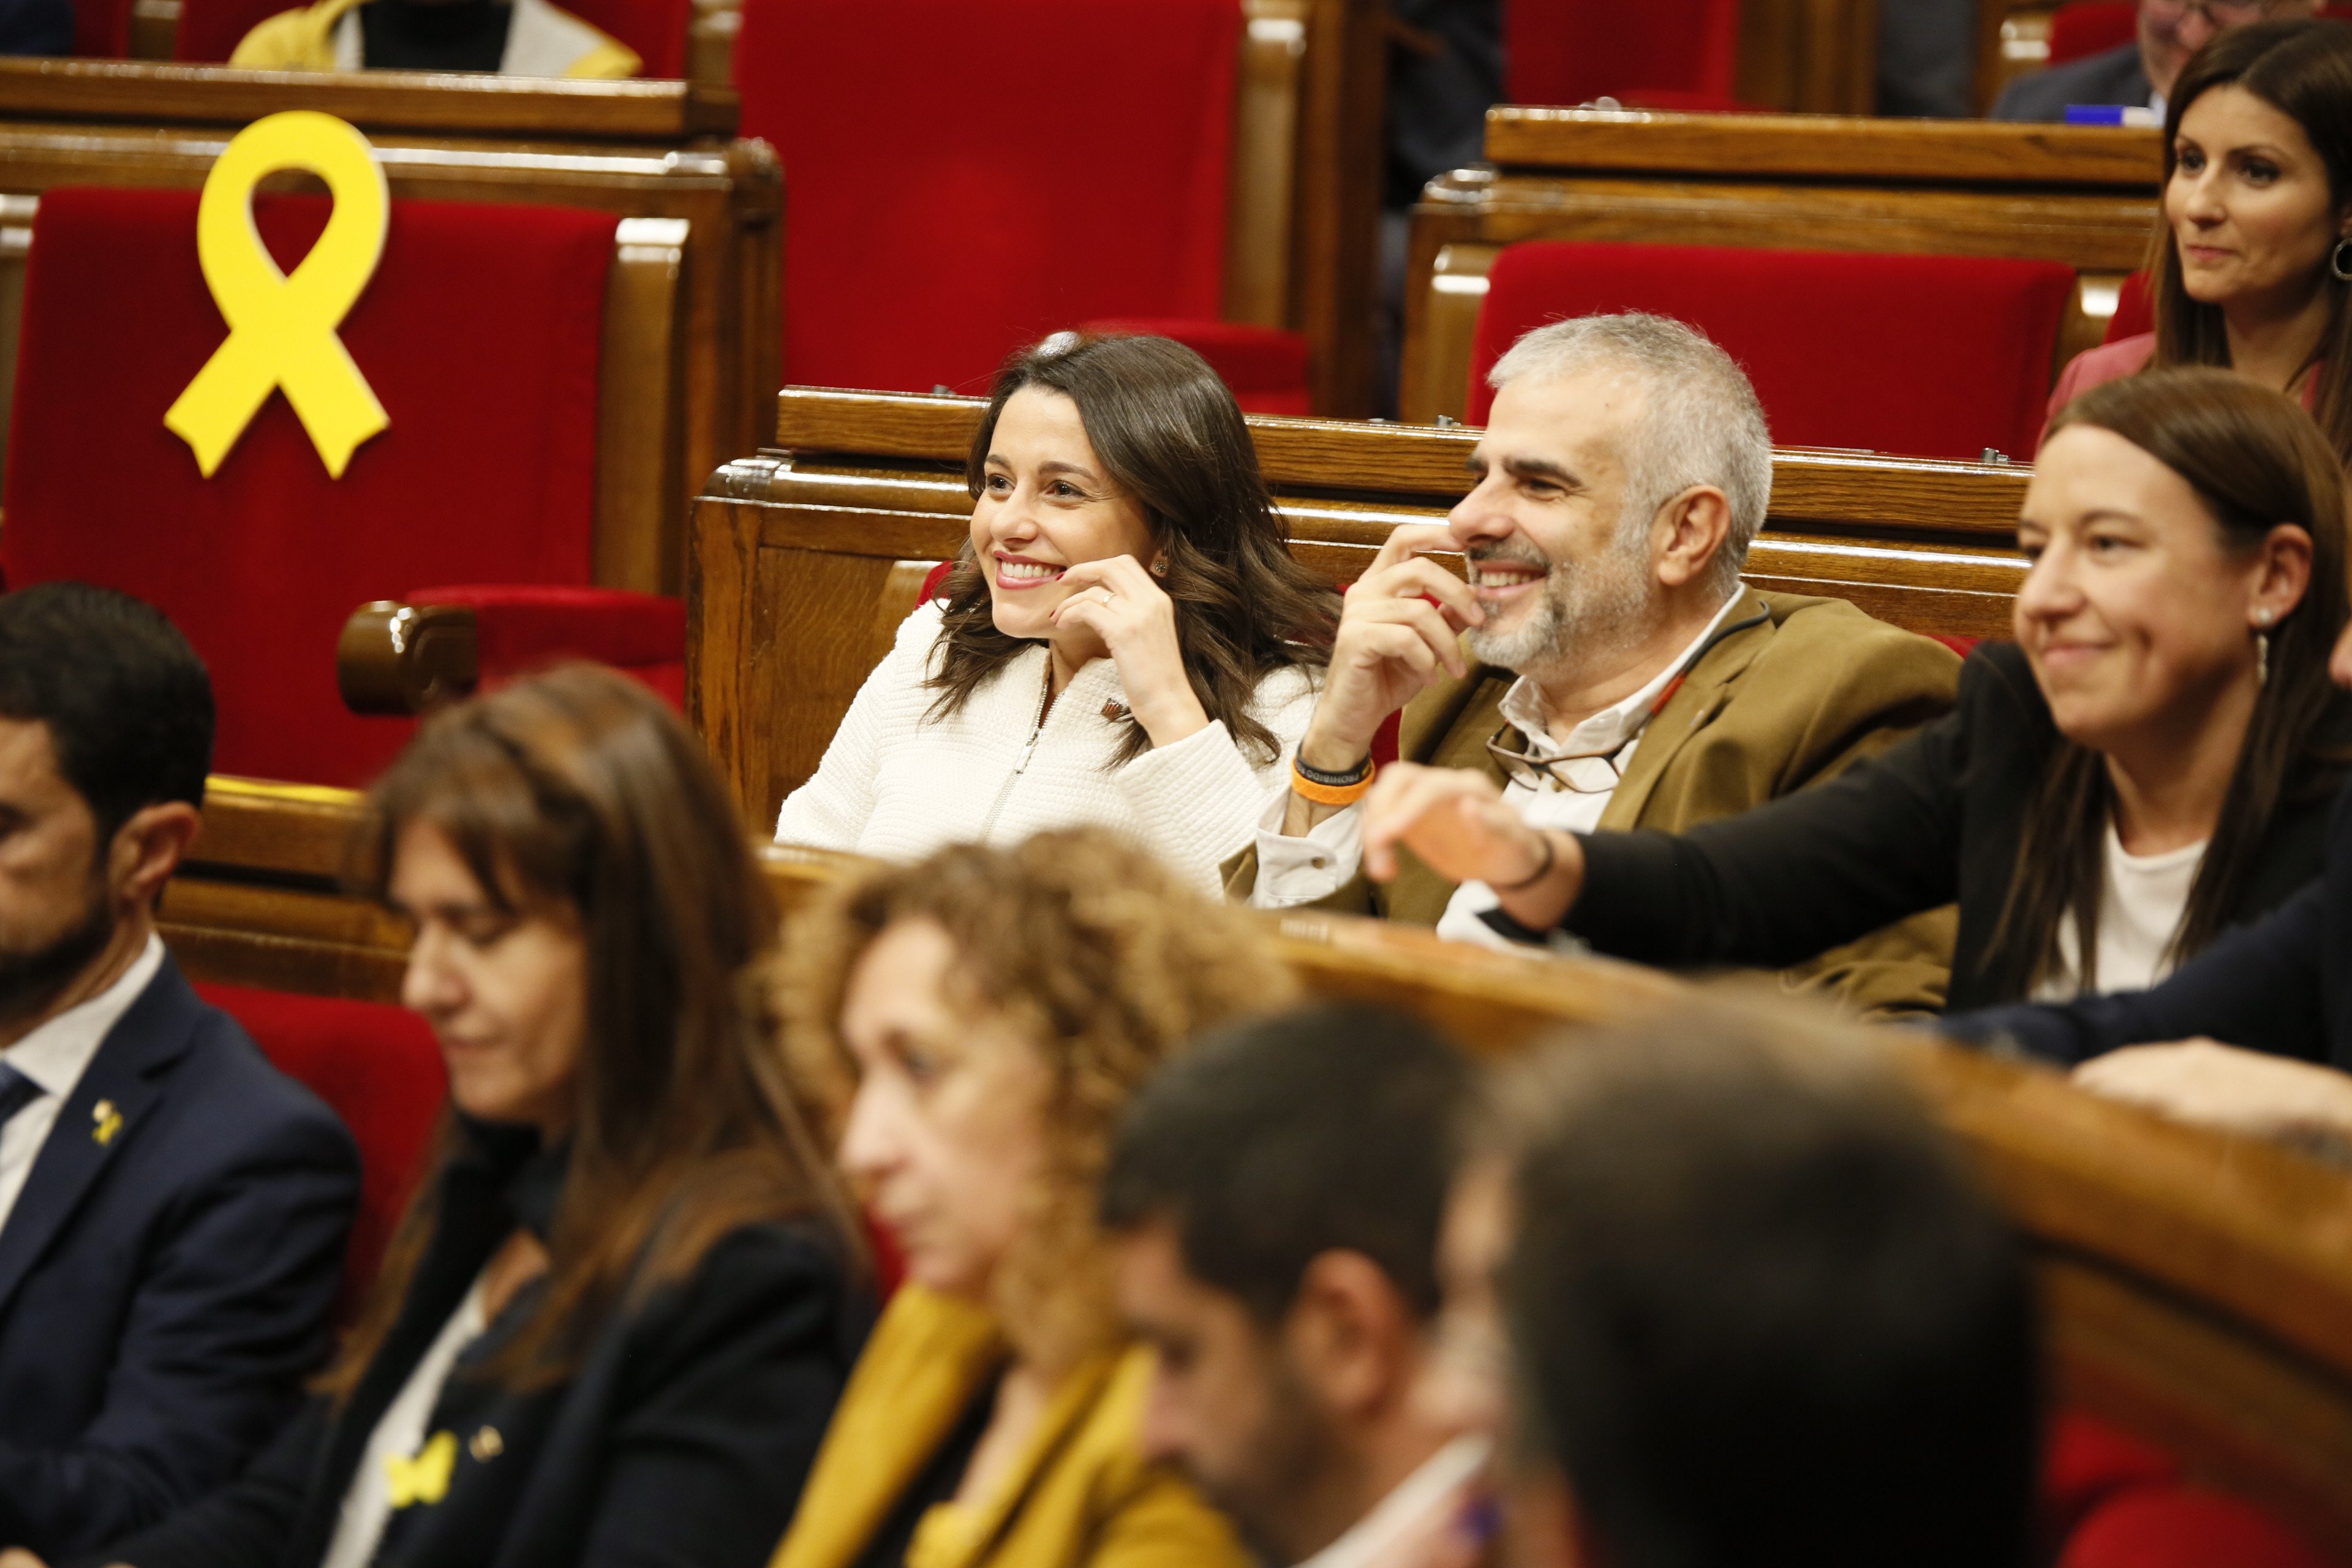 Ciutadans rient Arrimadas Carrizosa - Sergi Alcàzar